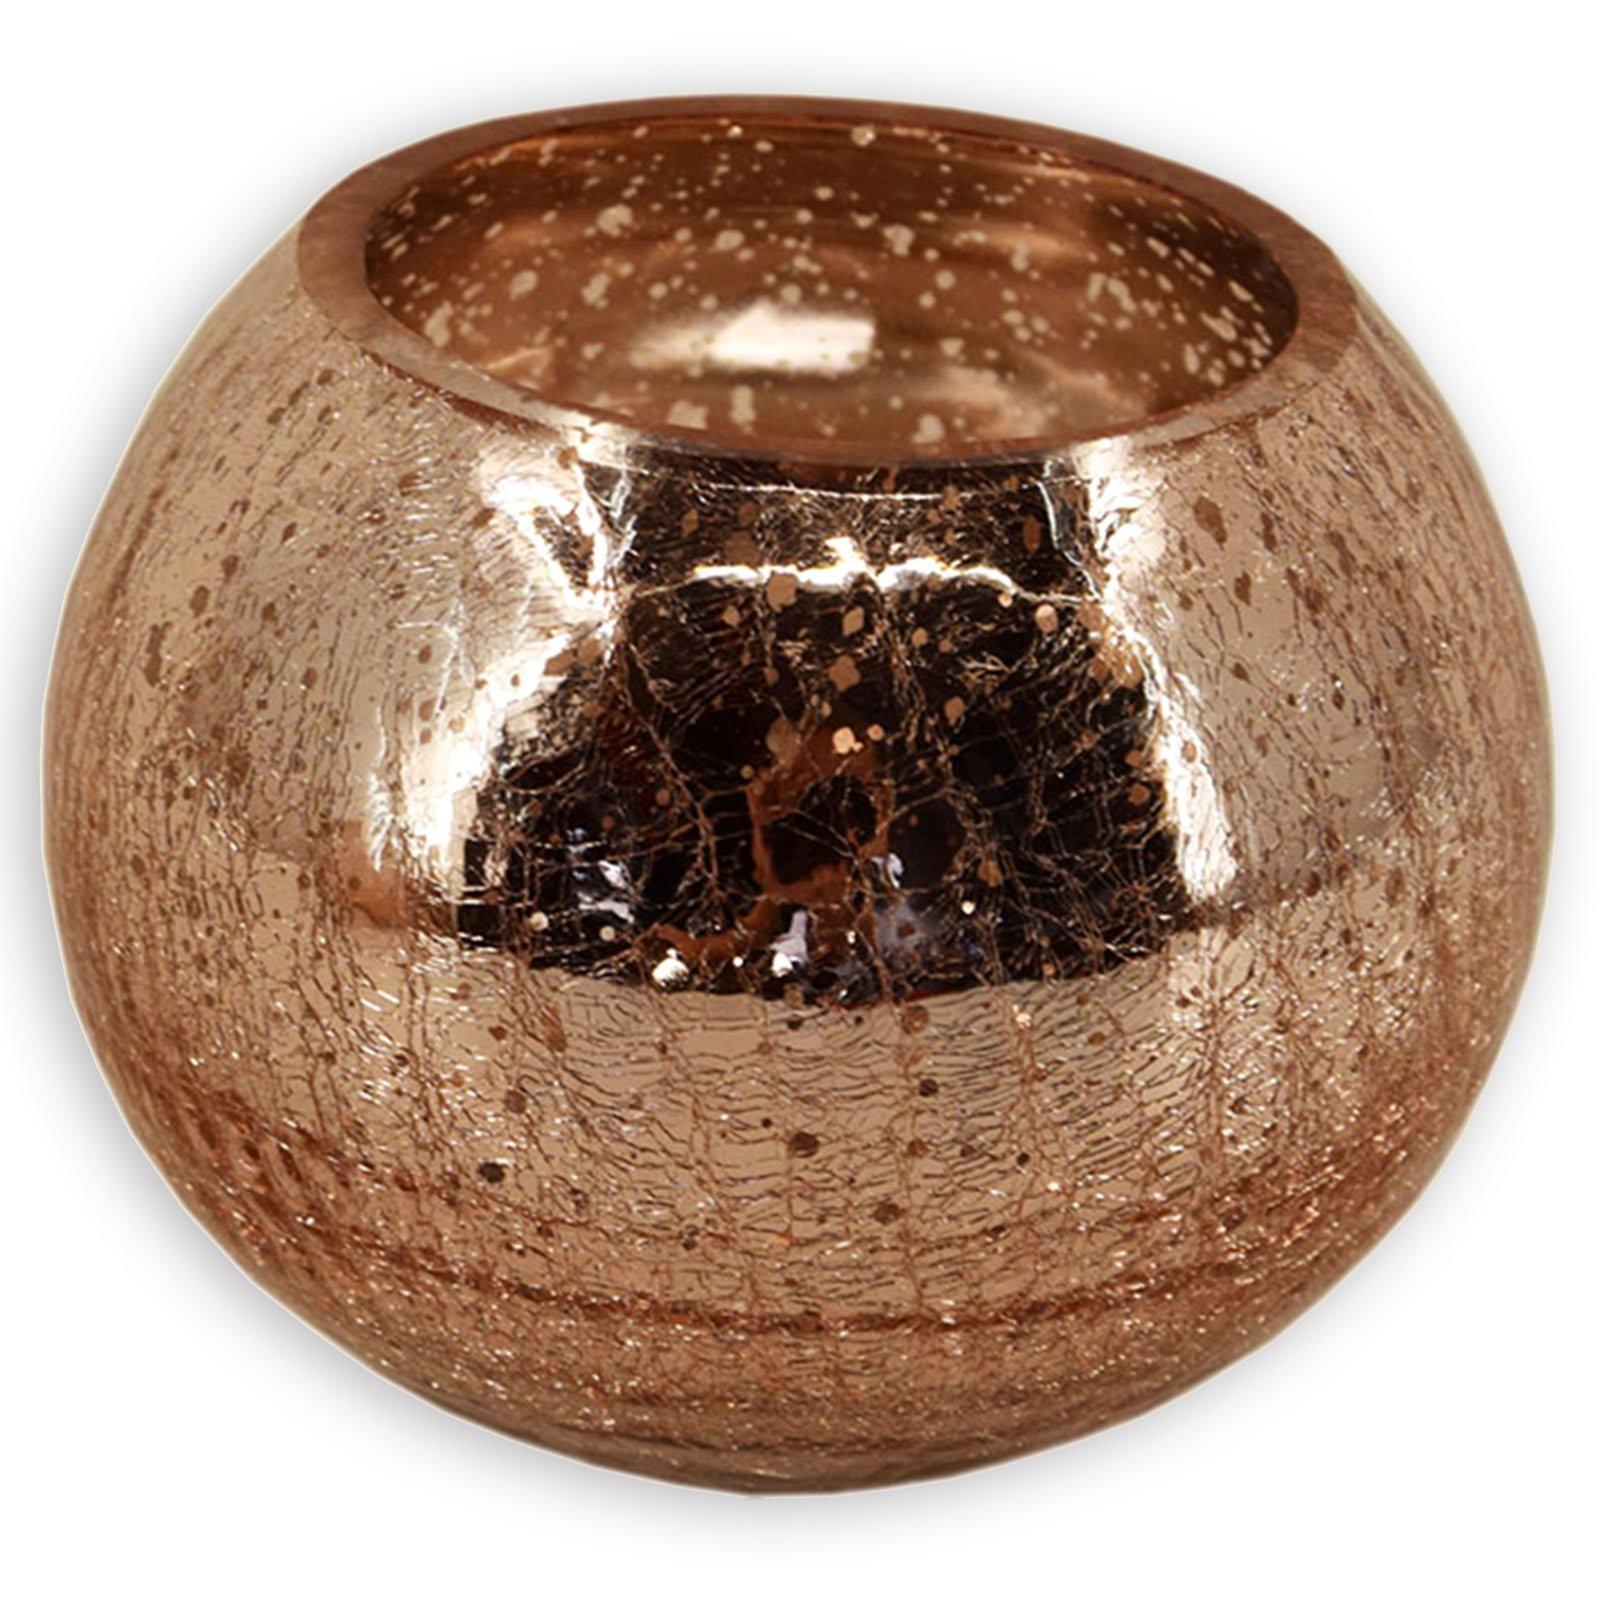 Windlichtglas kupfer kugel 20 cm kerzen - Gartendekoration kupfer ...